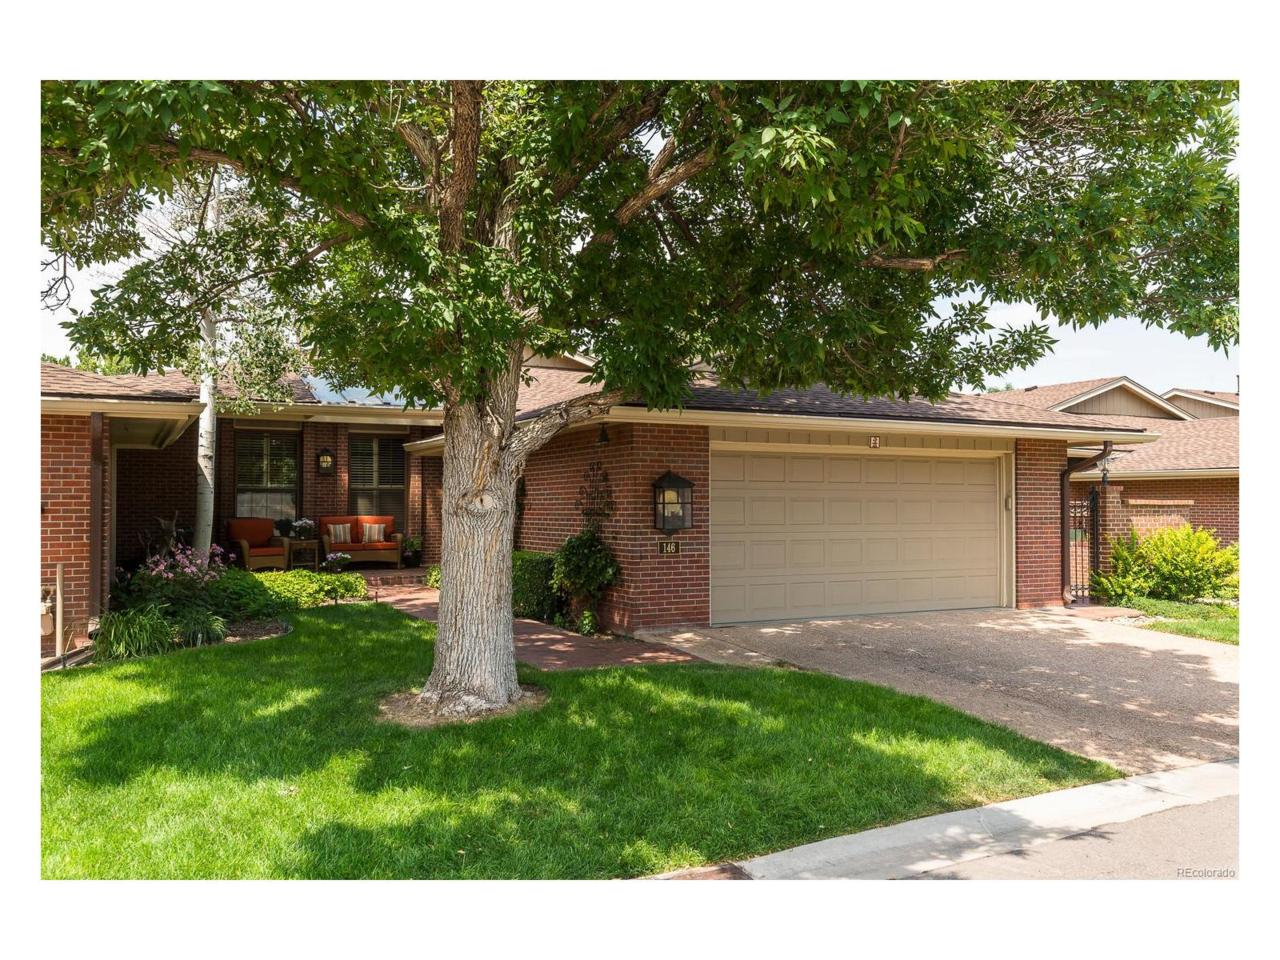 2800 S University Boulevard #146, Denver, CO 80210 (MLS #2579044) :: 8z Real Estate